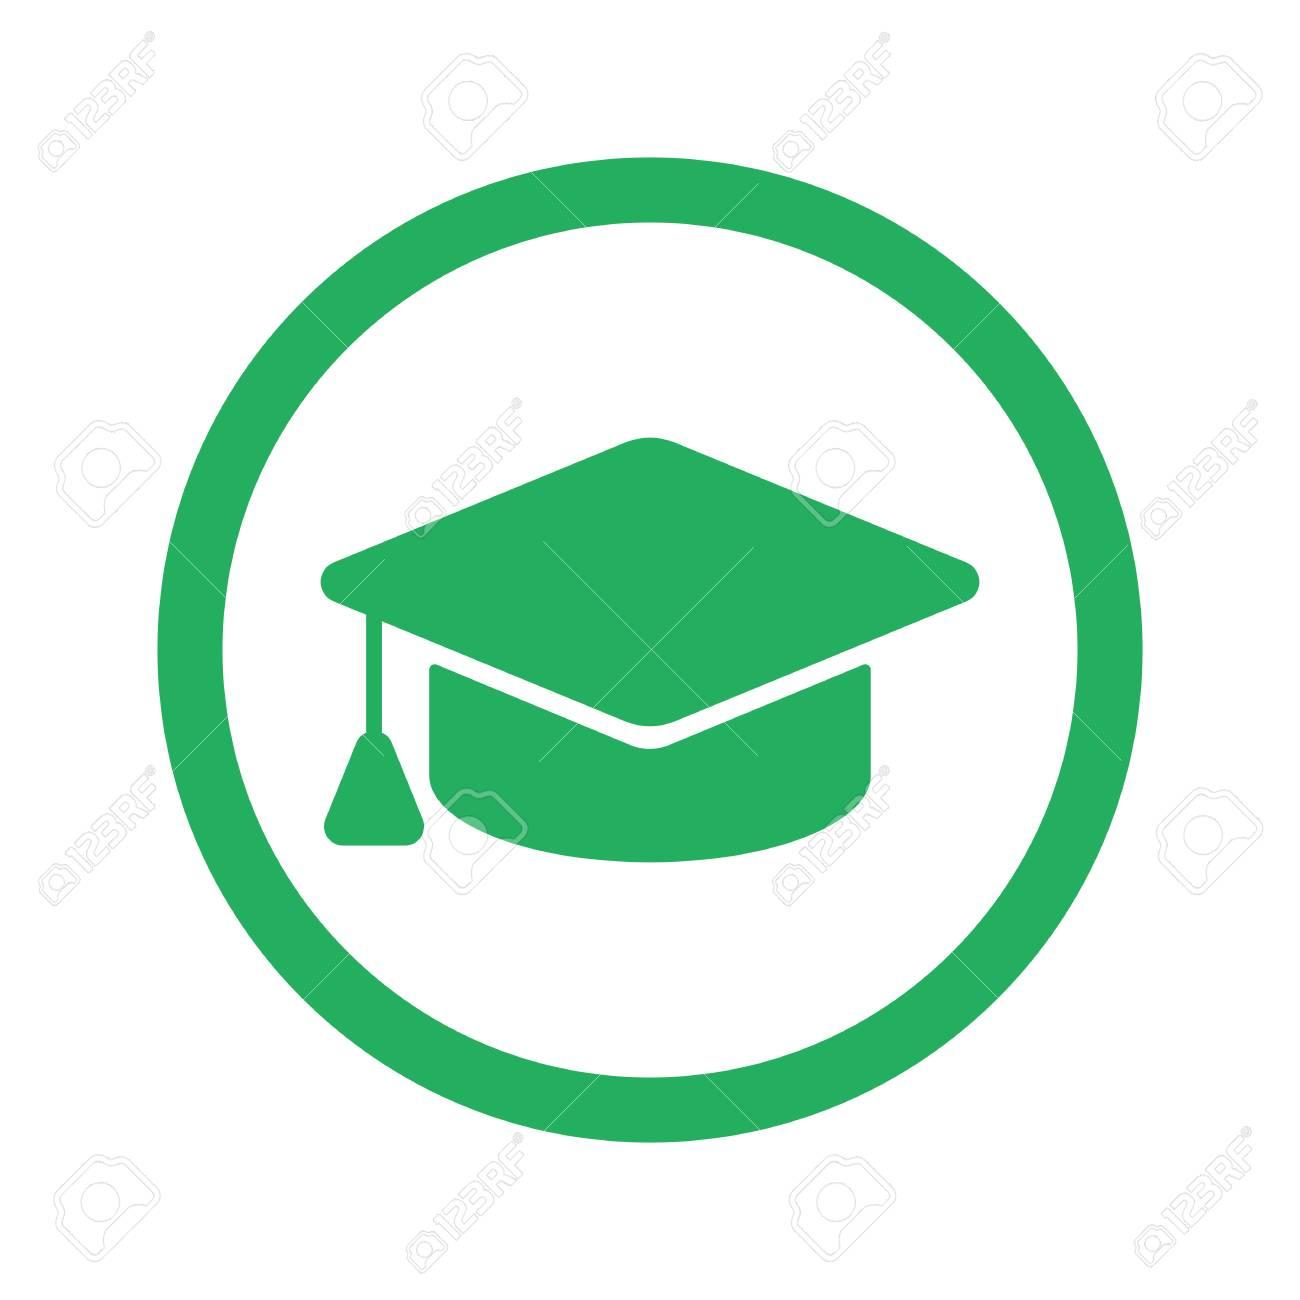 Flat green Graduation Cap icon and green circle.